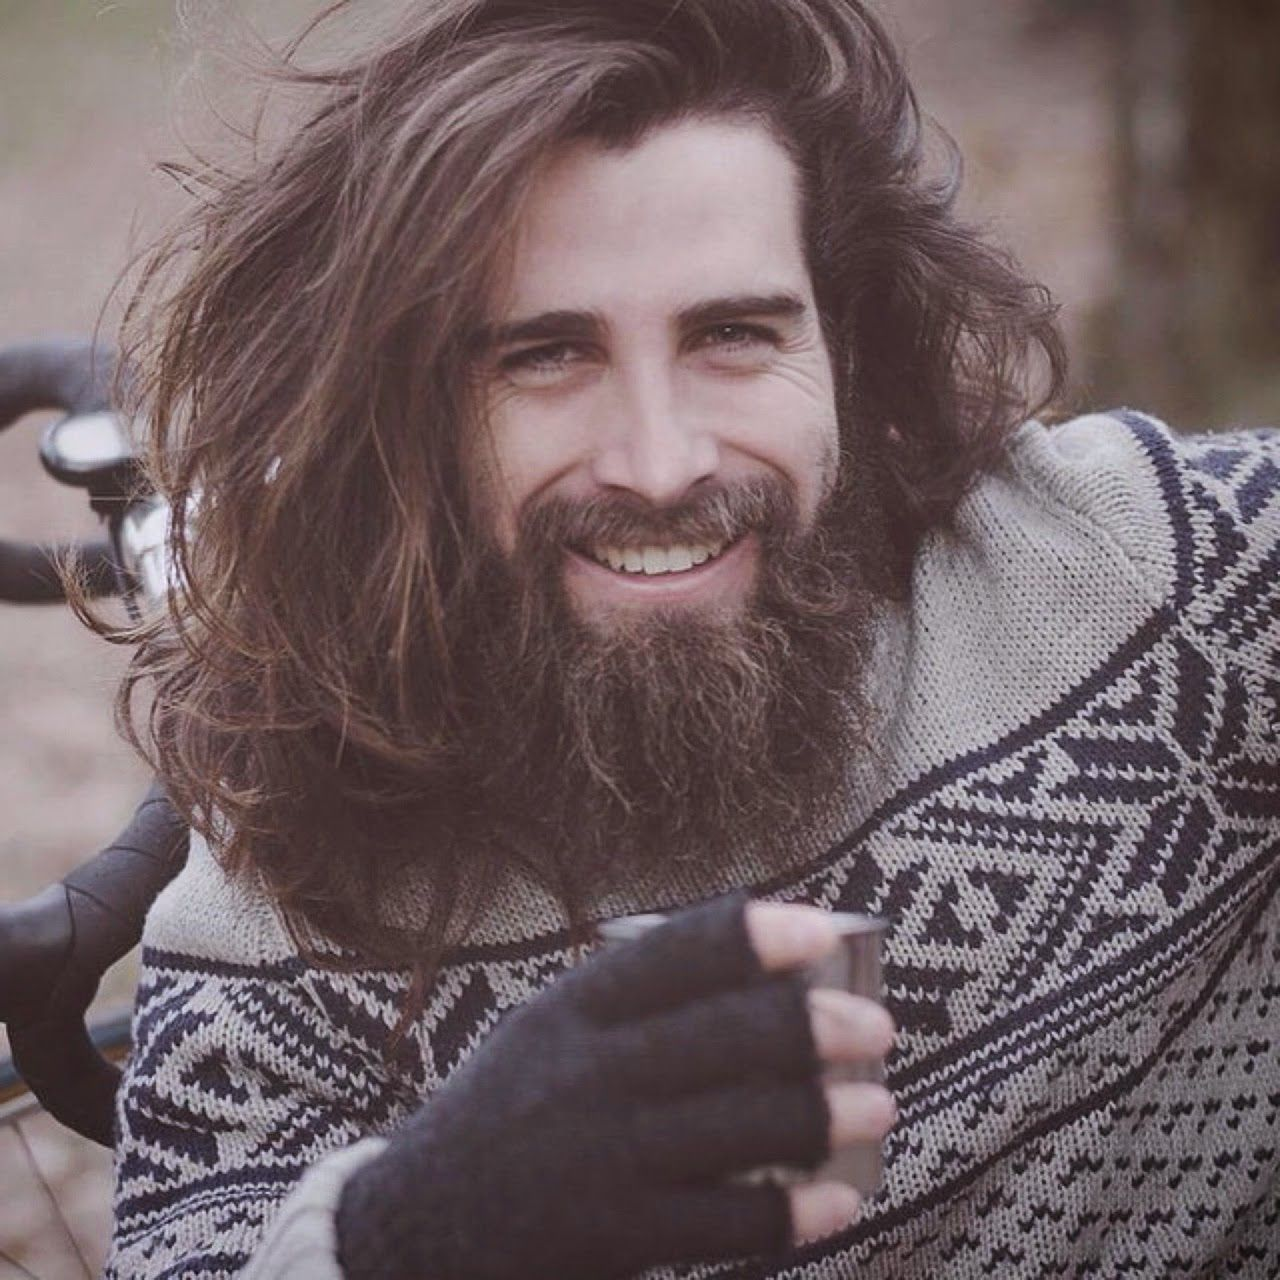 Prime 1000 Images About Beard On Pinterest Men With Long Hair Short Hairstyles For Black Women Fulllsitofus